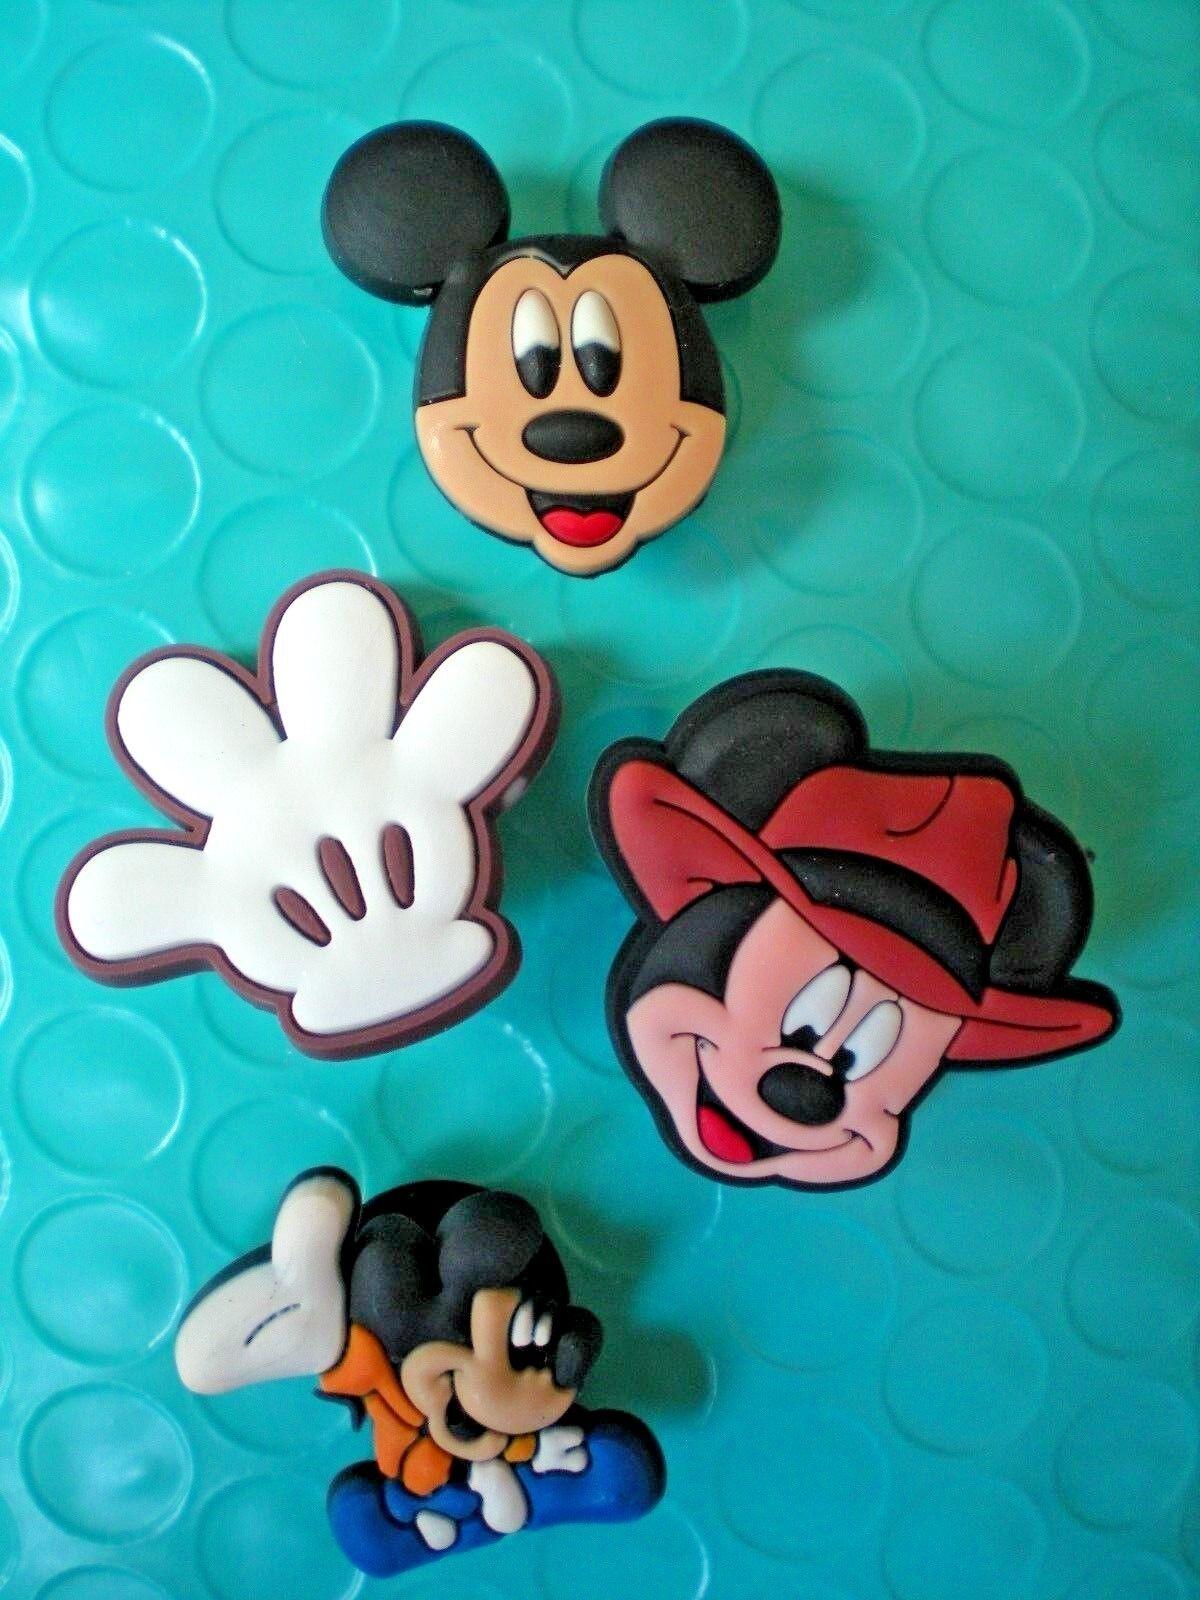 Clog Shoe Plug Charms 4 Mickey Mouse Fit Bracelet Belt Accessories